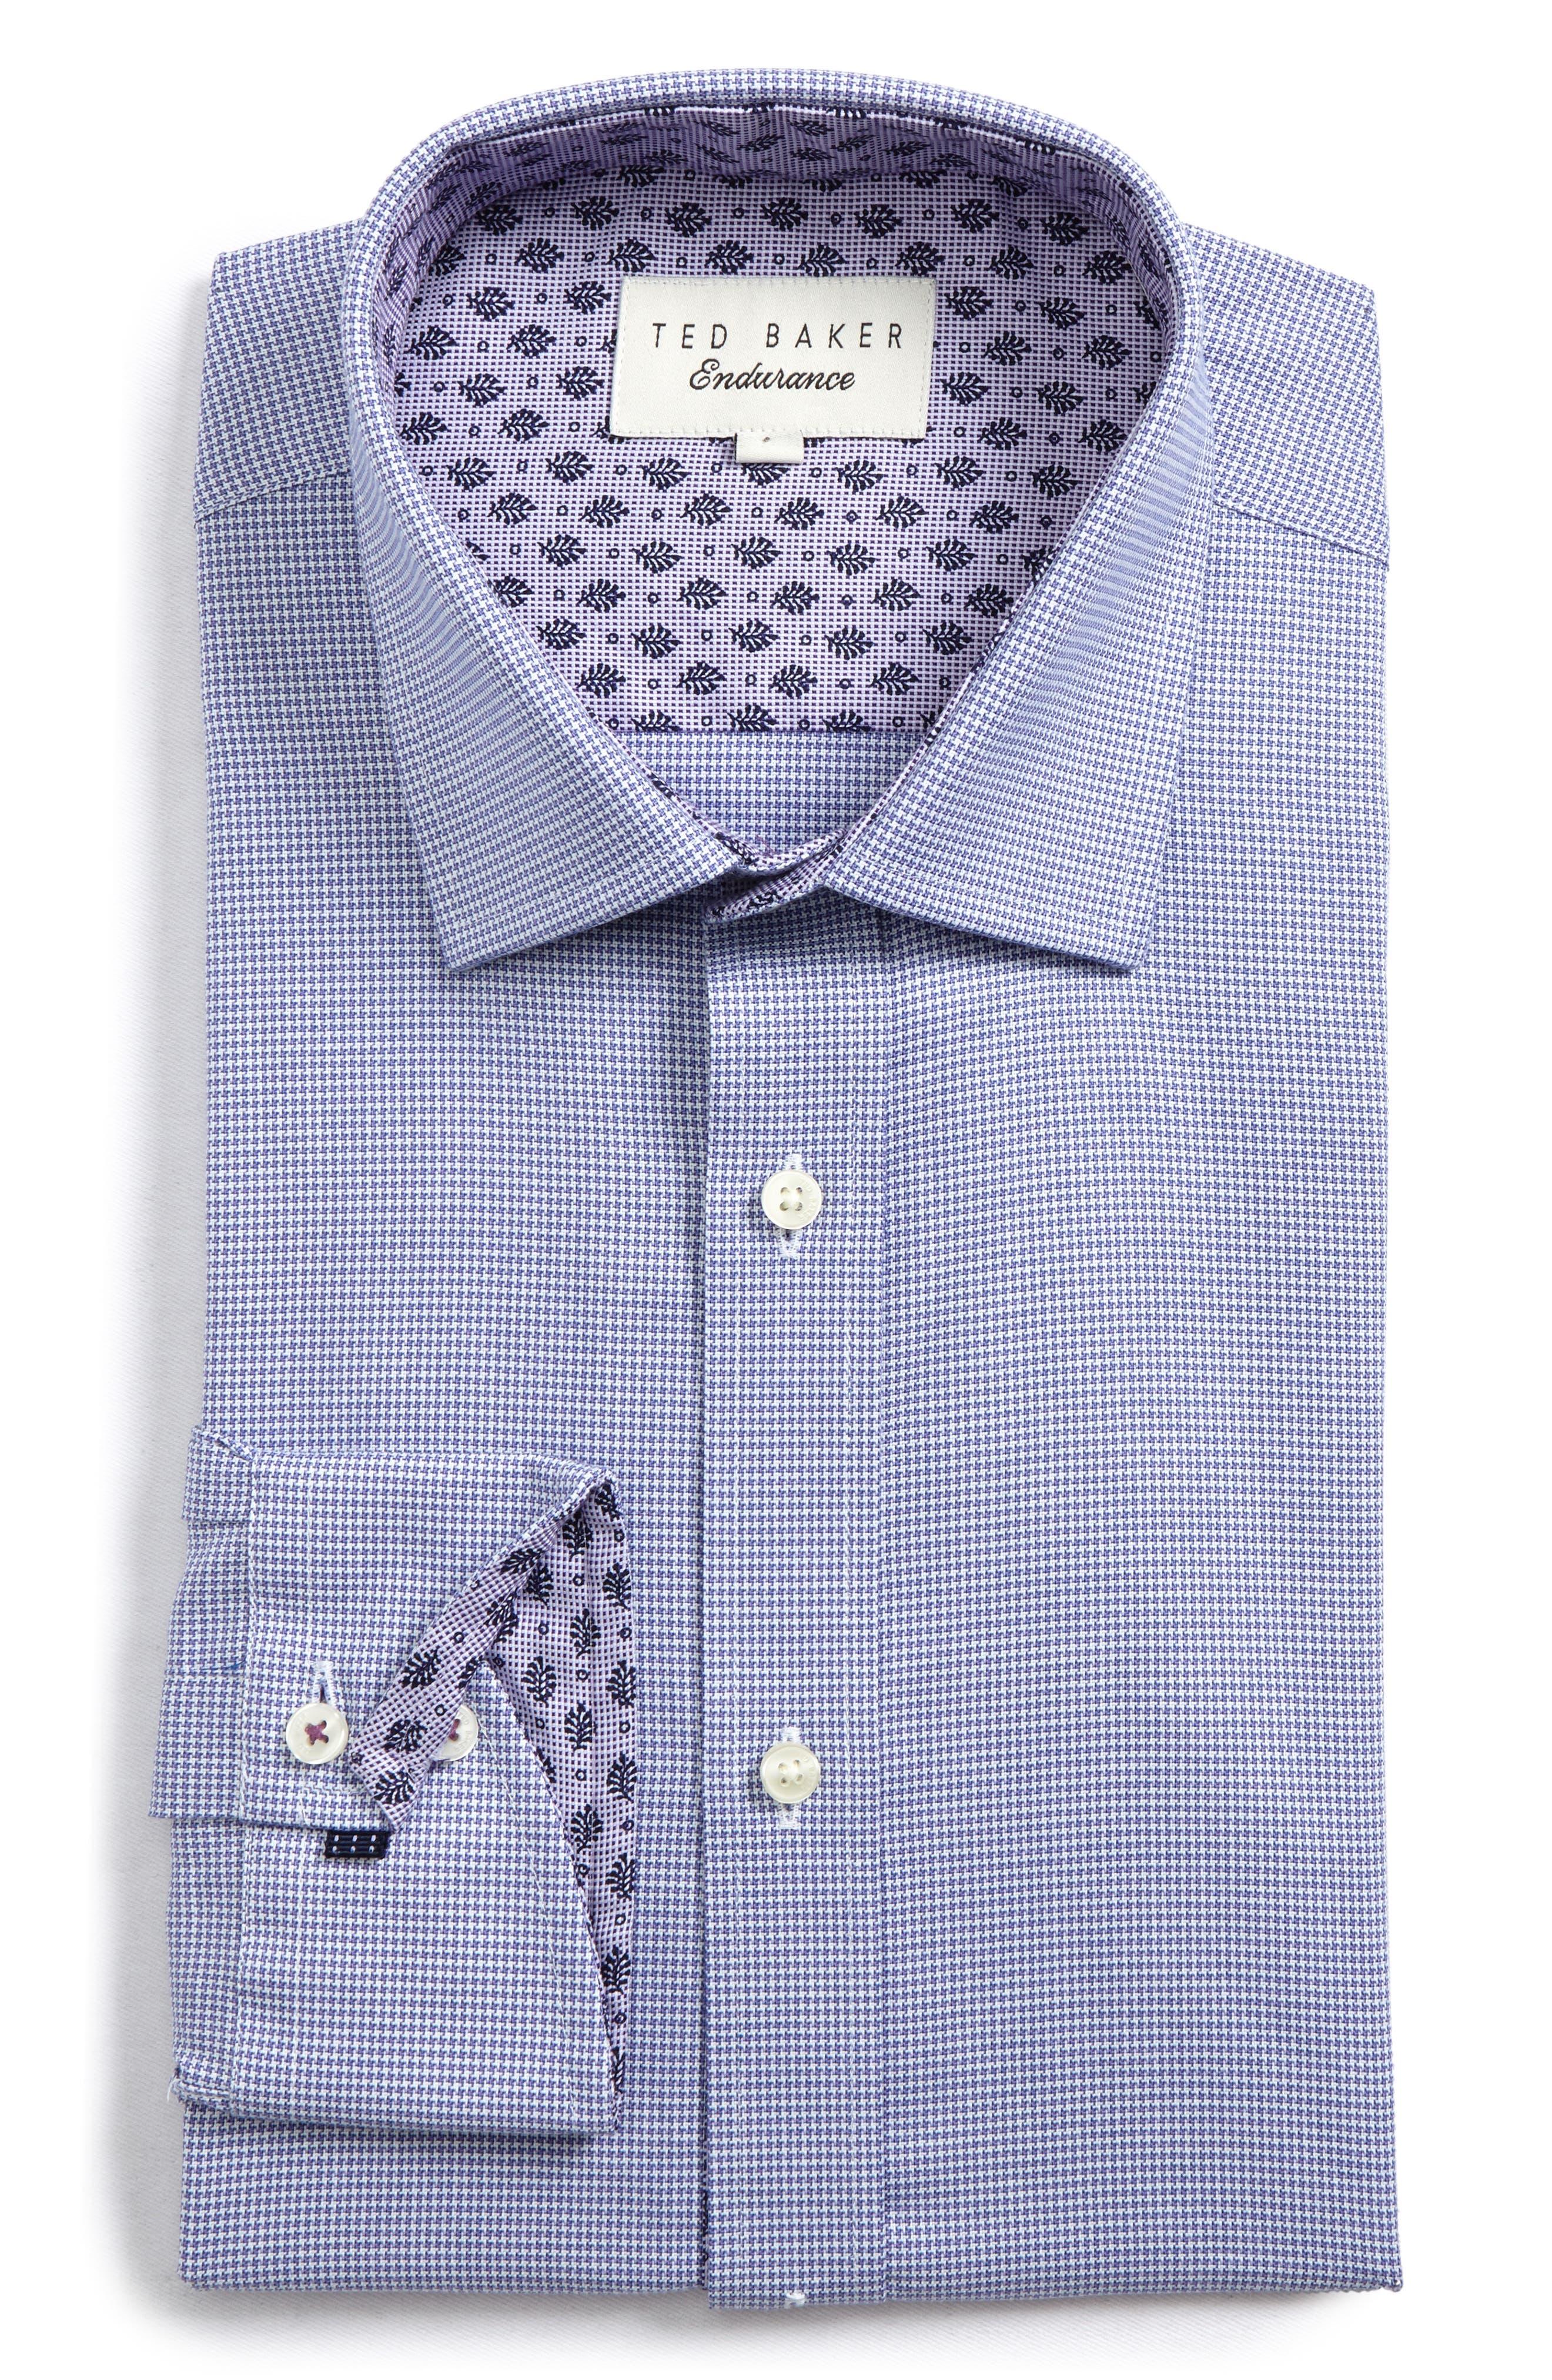 Endurance Renton Trim Fit Dress Shirt,                             Main thumbnail 1, color,                             Purple